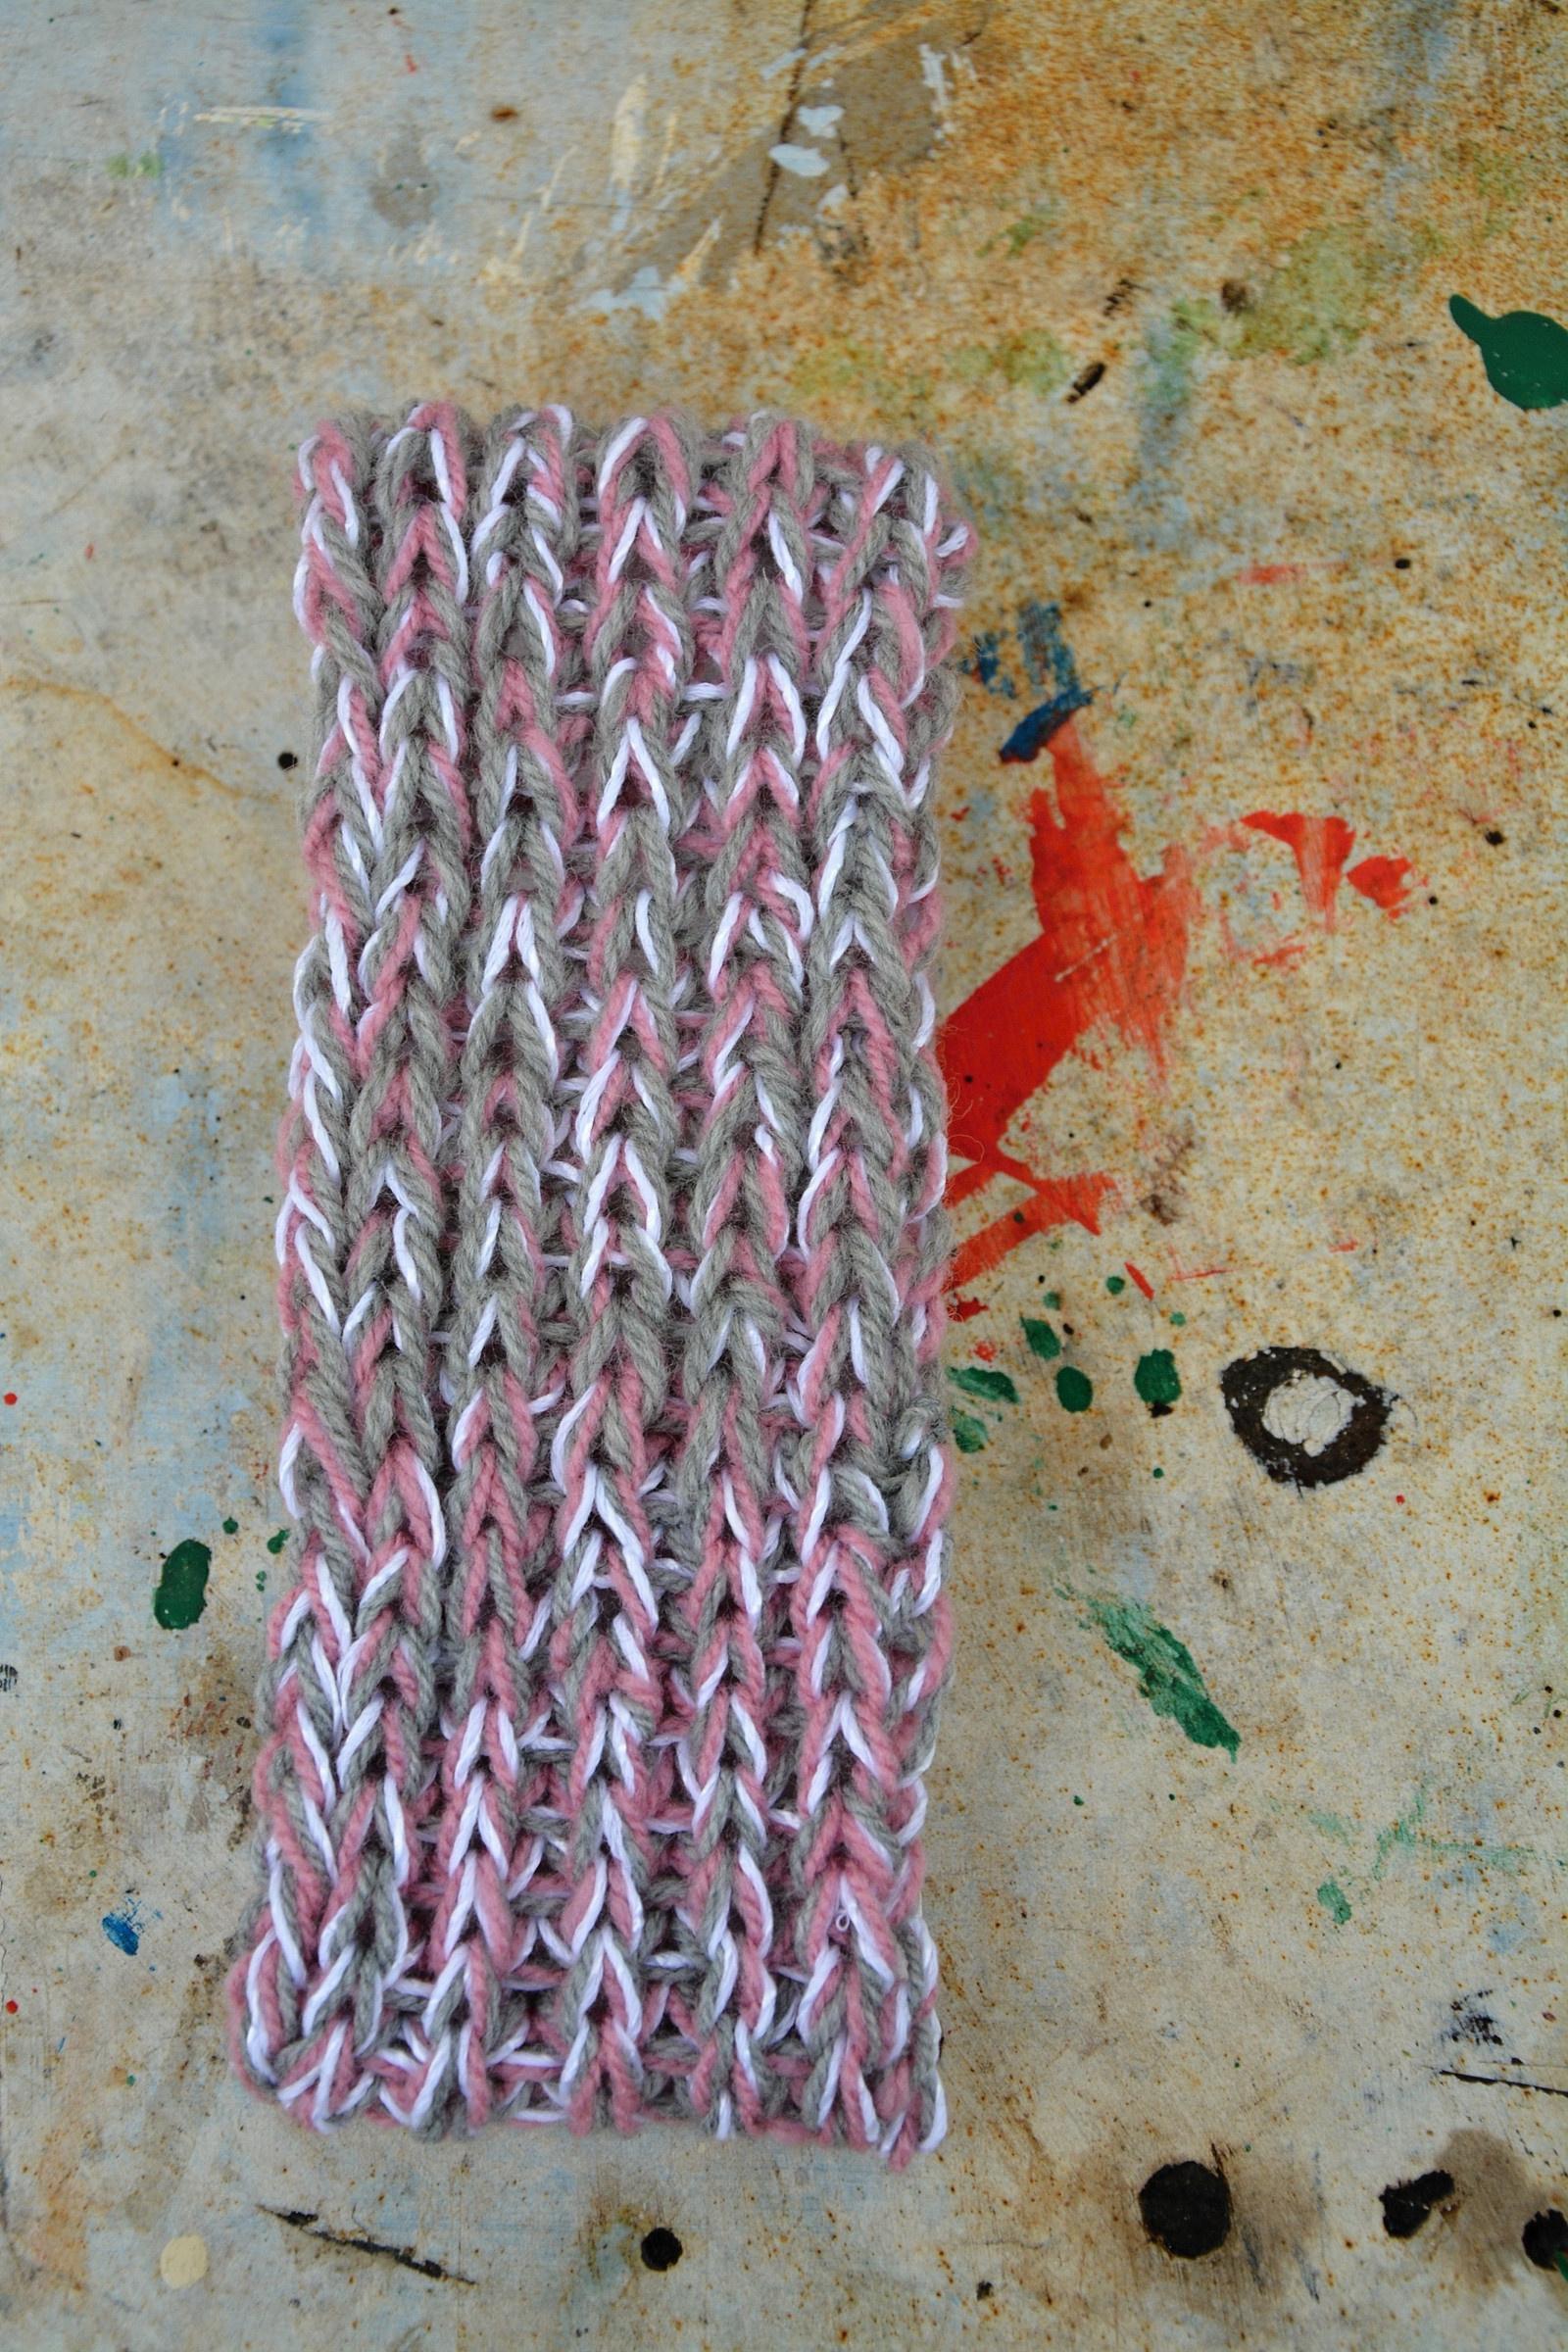 88a9f5723f4 Pletená čelenka s copy -růžový melír   Zboží prodejce Švambi74